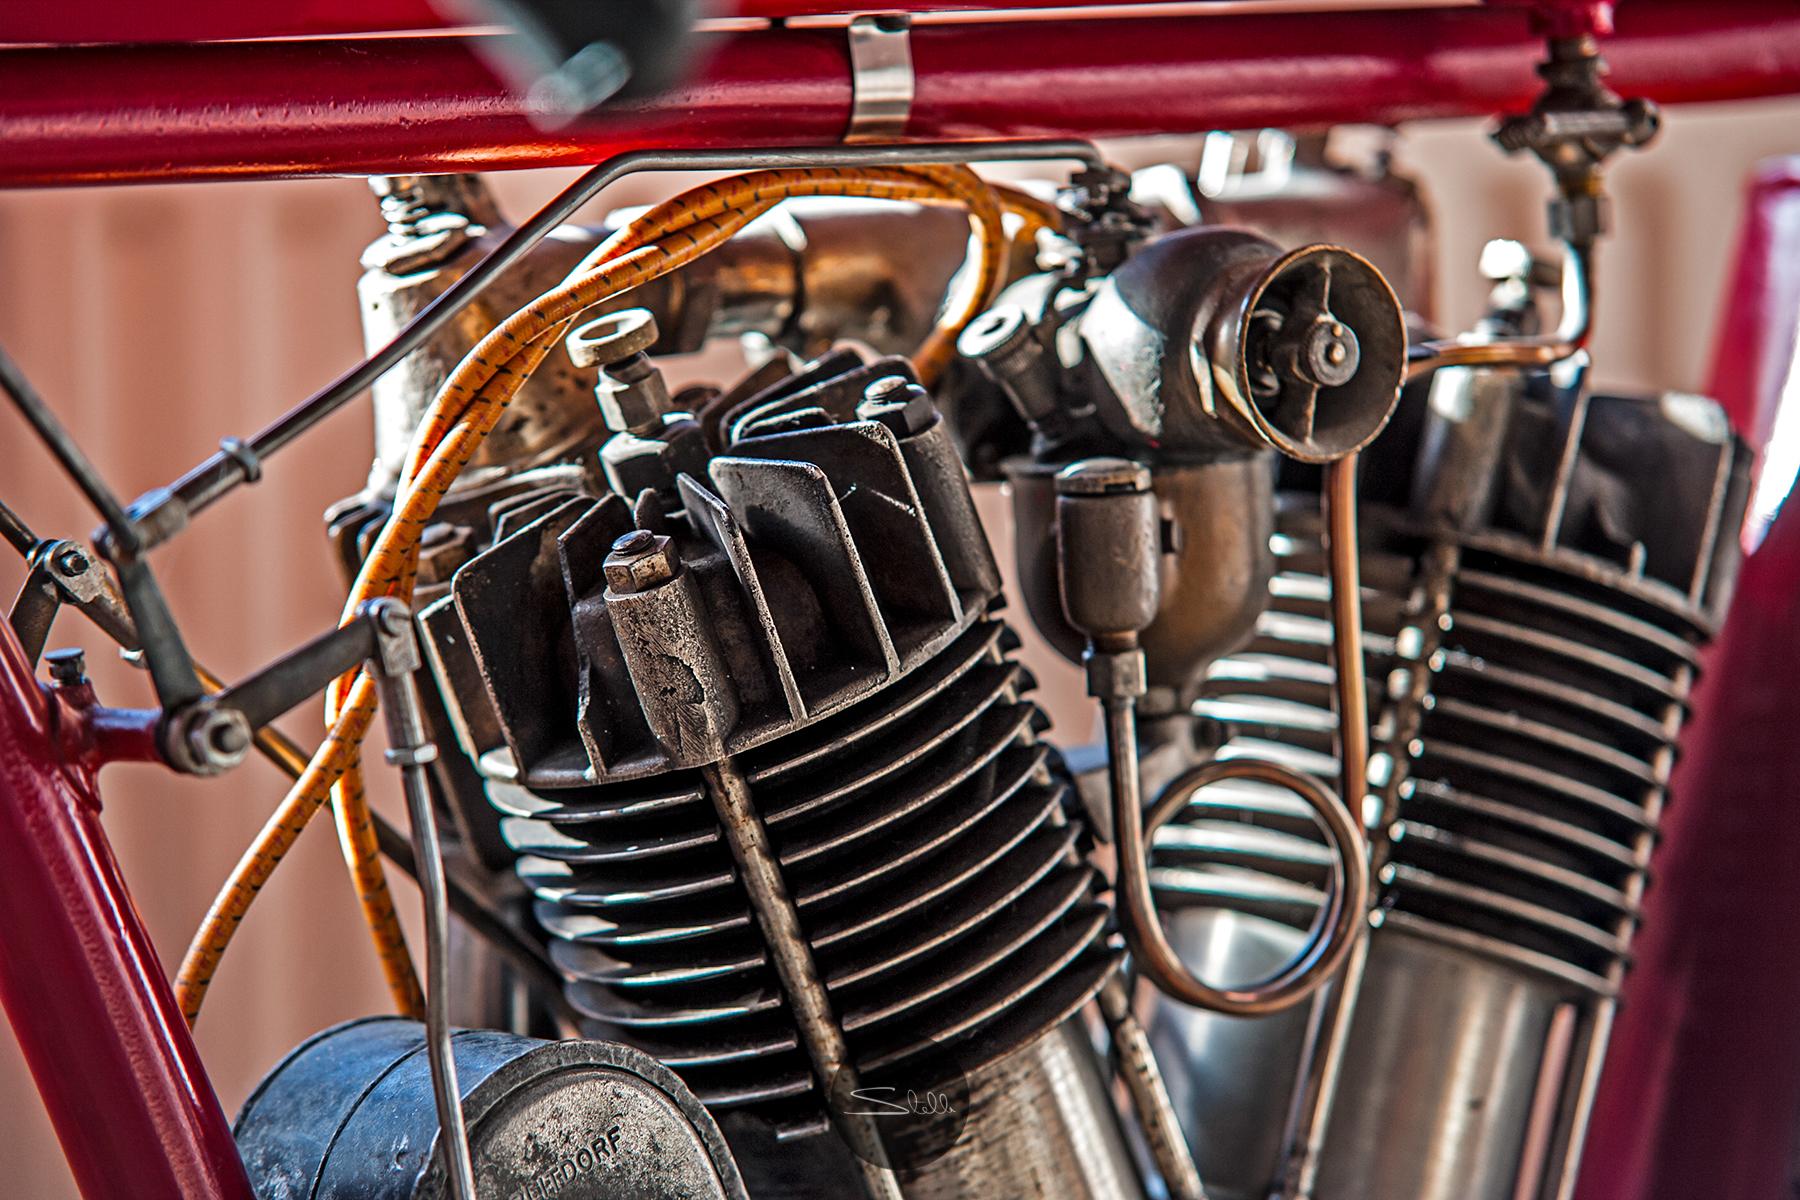 Stella Scordellis Indian Board Racer Engine Watermarked.jpg